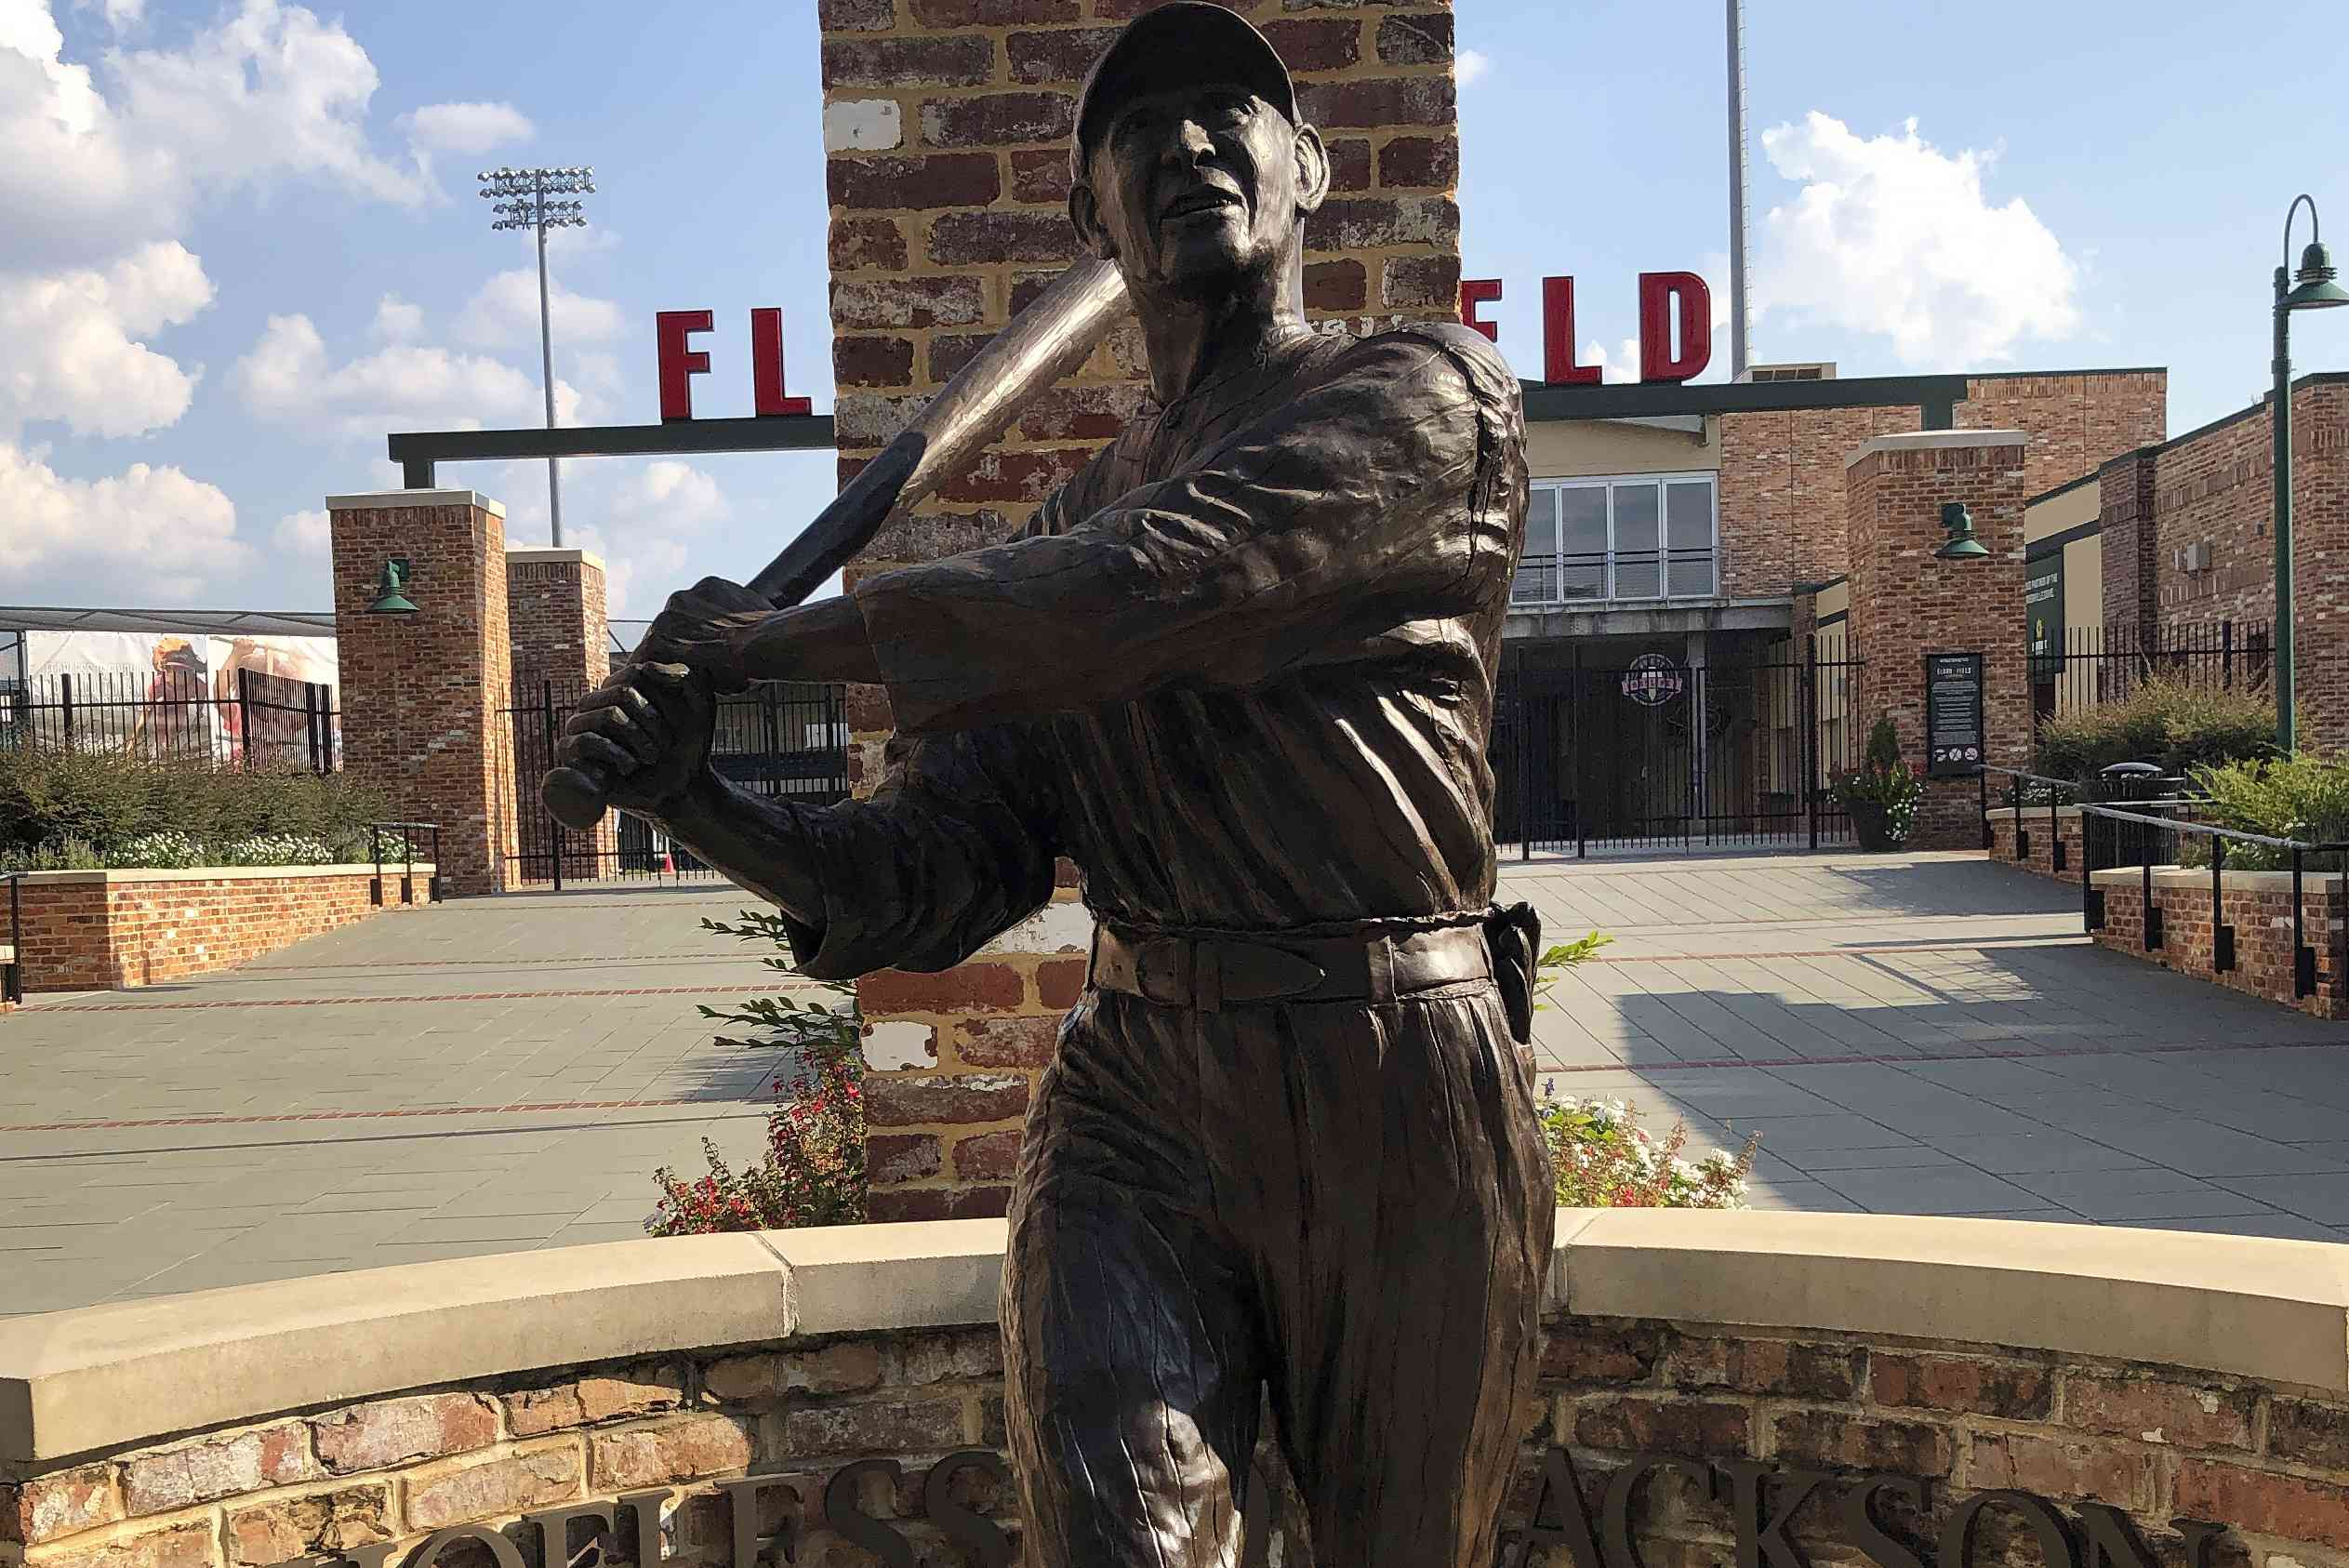 bronze statue of the baseball player Shoeless Joe